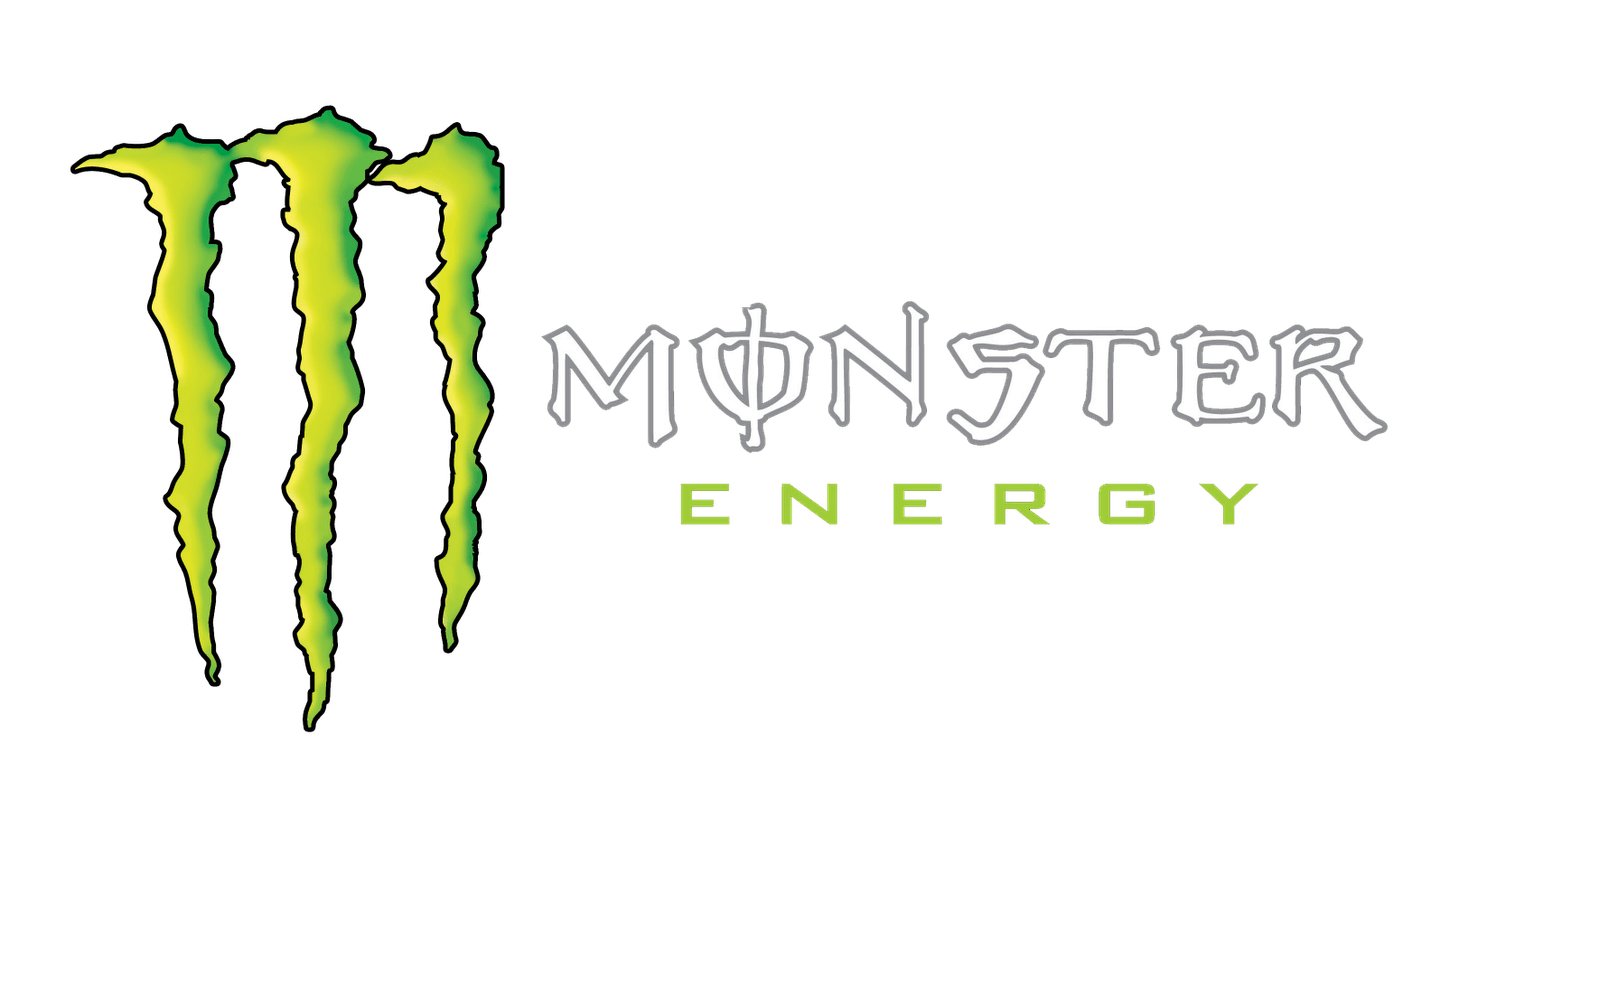 monster png logo wallpapers #3138